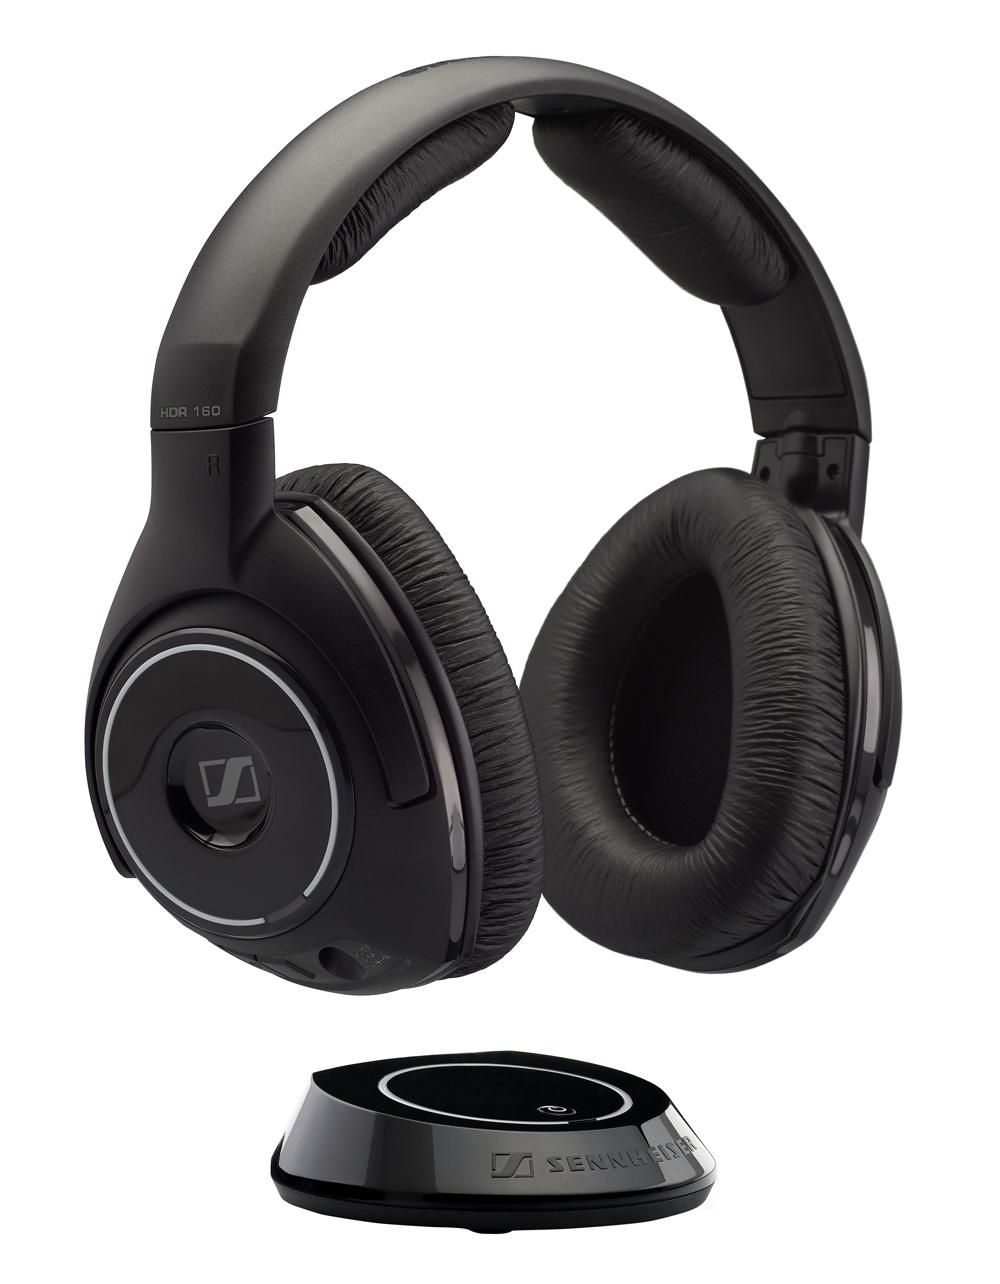 sennheiser rs 160 wireless audio headphones digital stereo bass driven sound ideal for. Black Bedroom Furniture Sets. Home Design Ideas